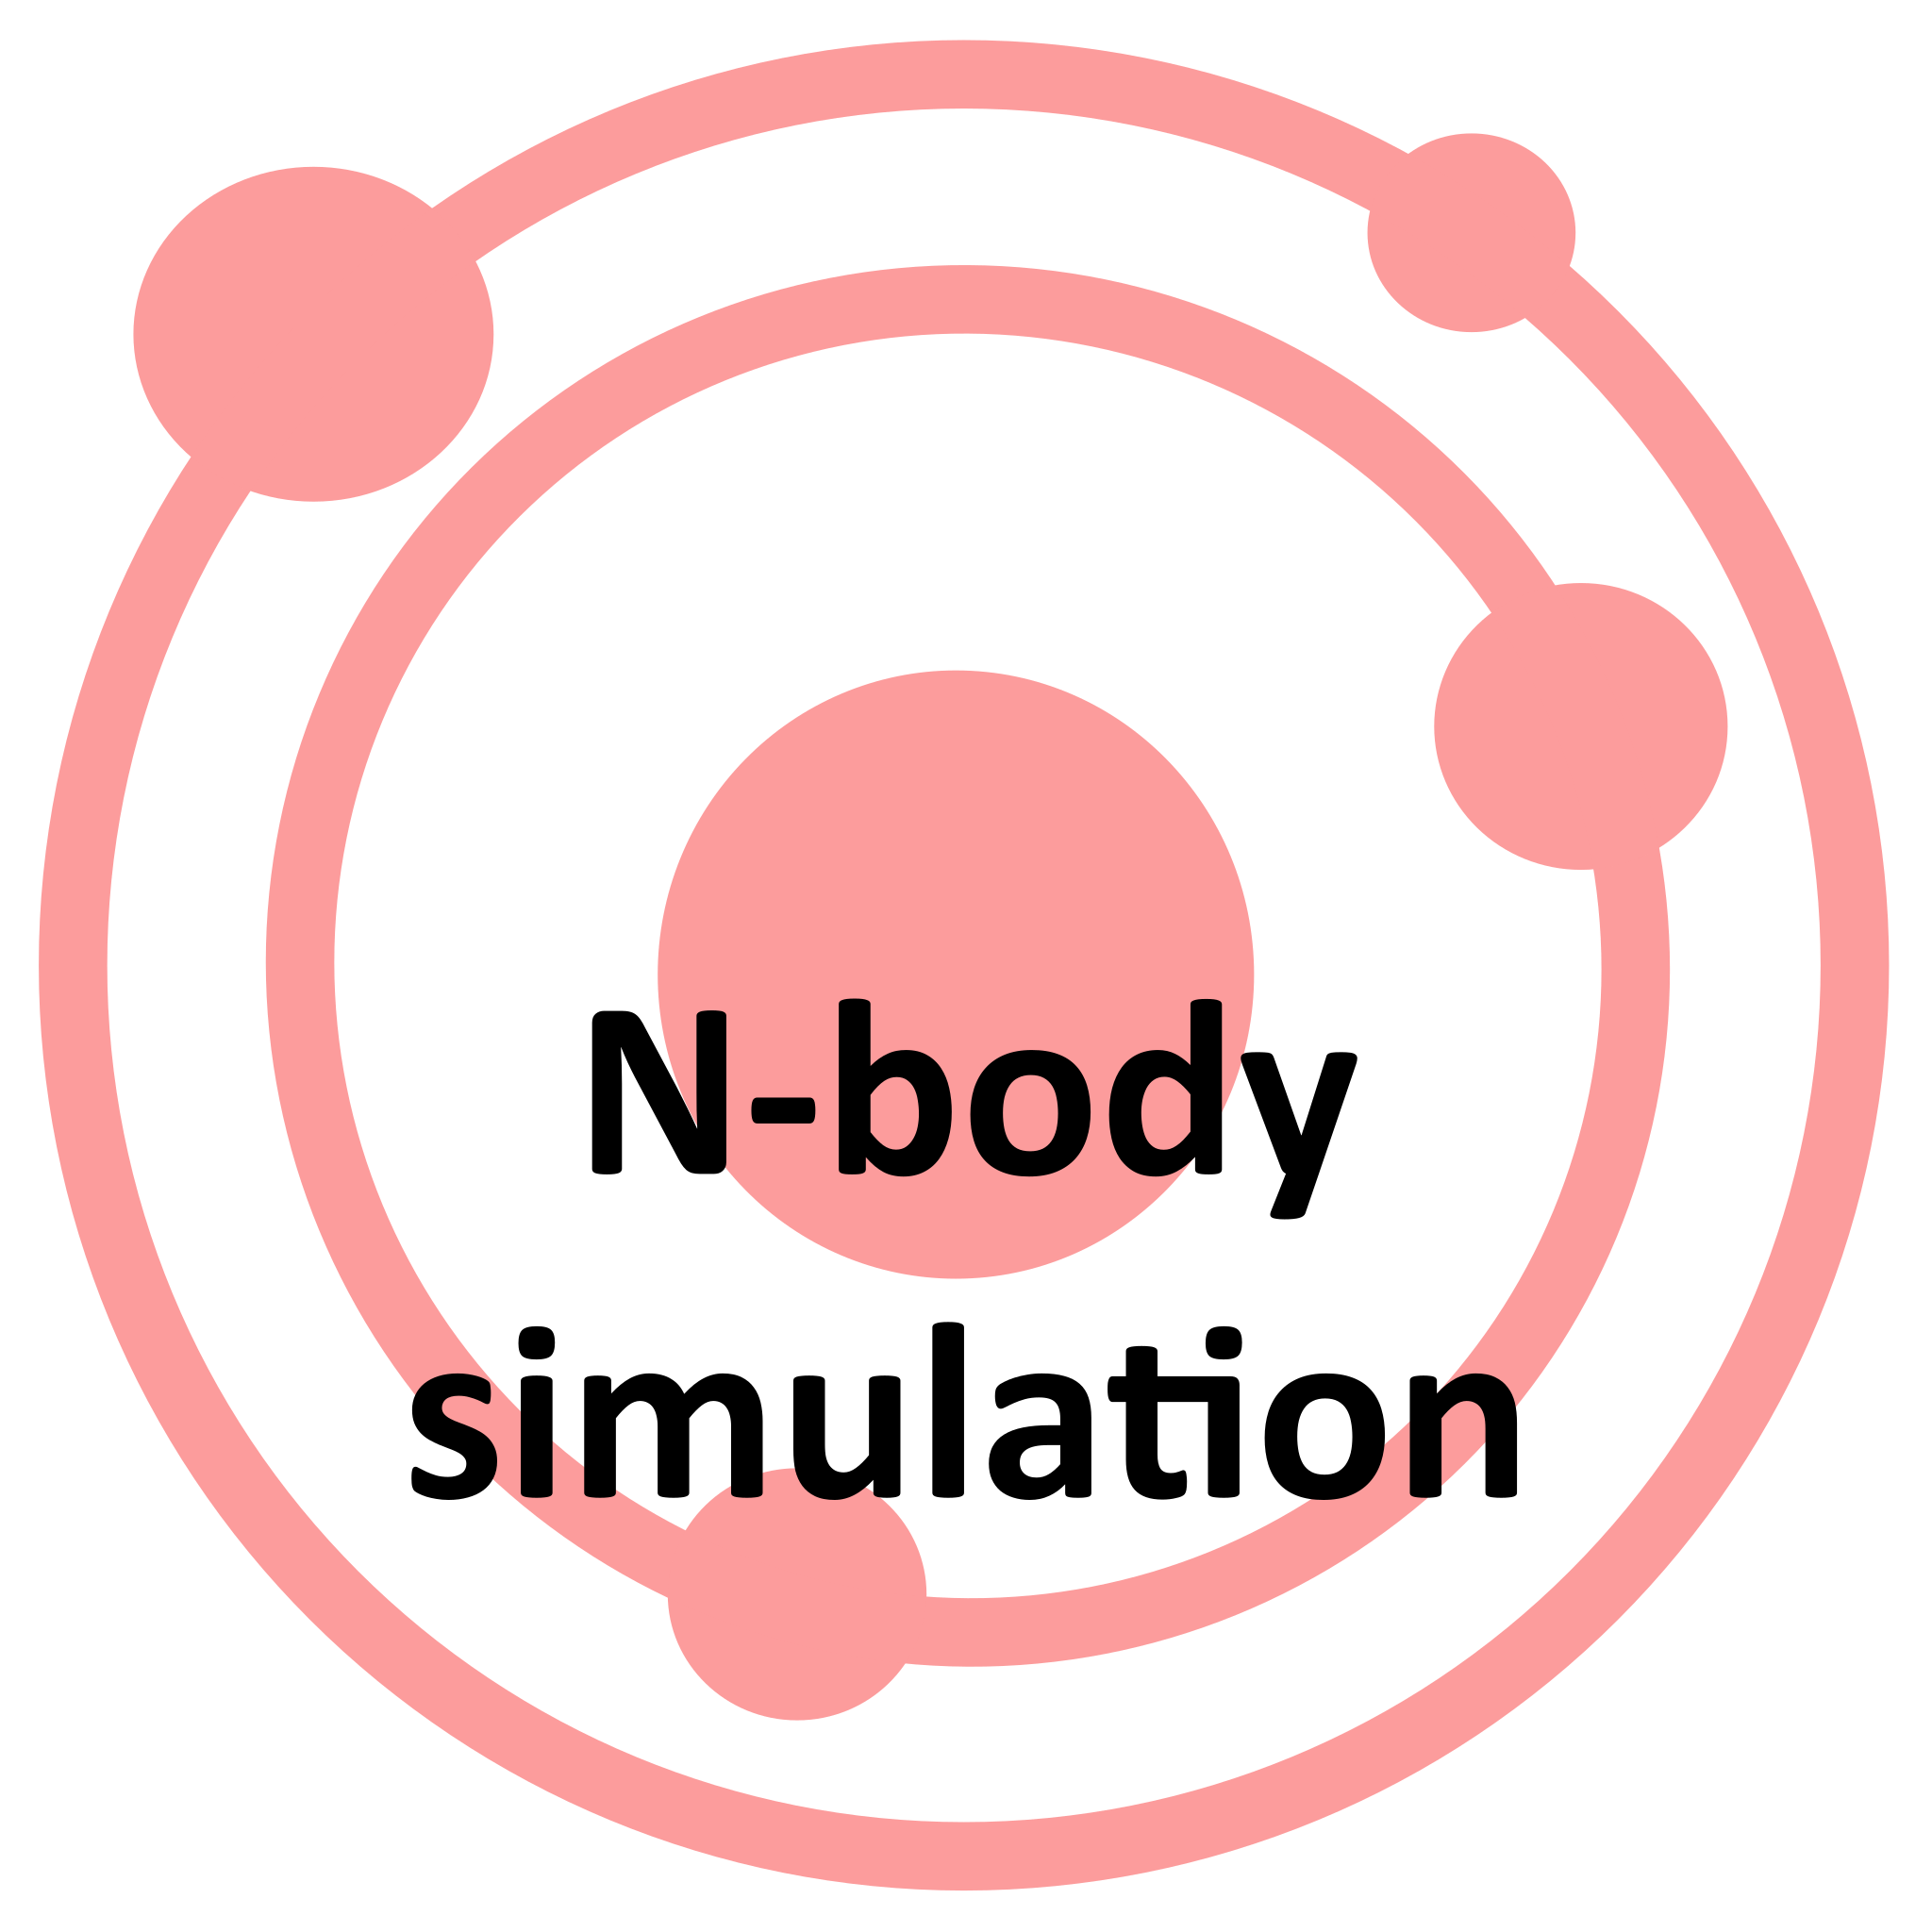 N-body simulation's icon